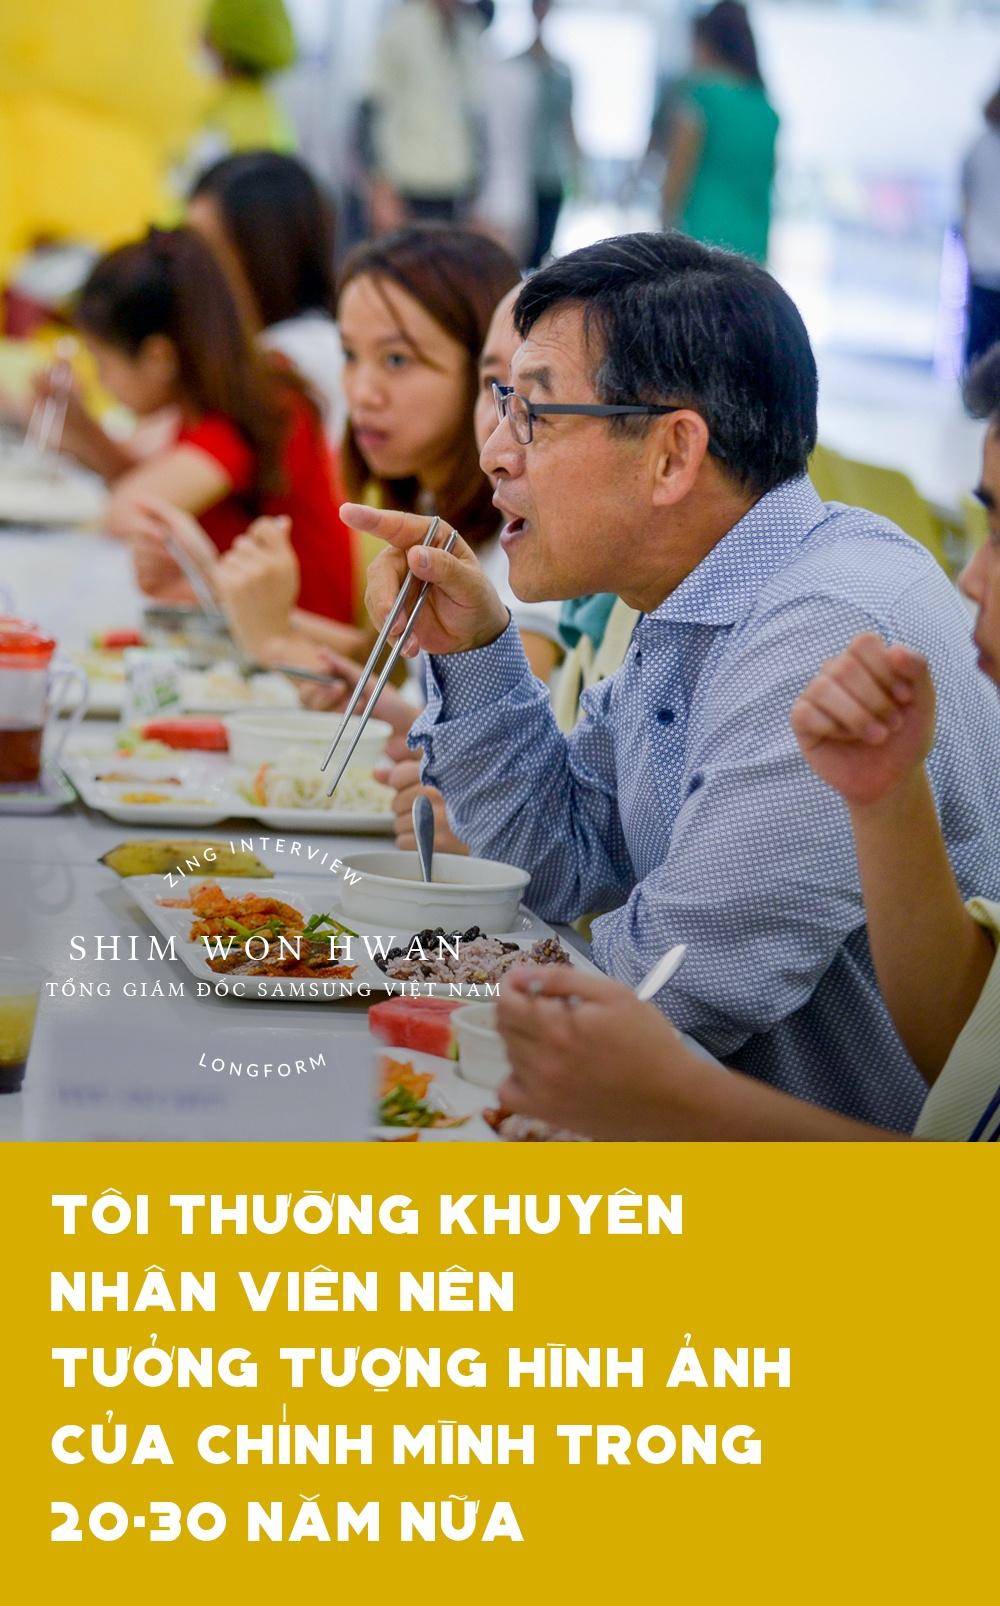 'Nhan vien nguoi Viet lam nen thanh cong cua Samsung Viet Nam' hinh anh 8